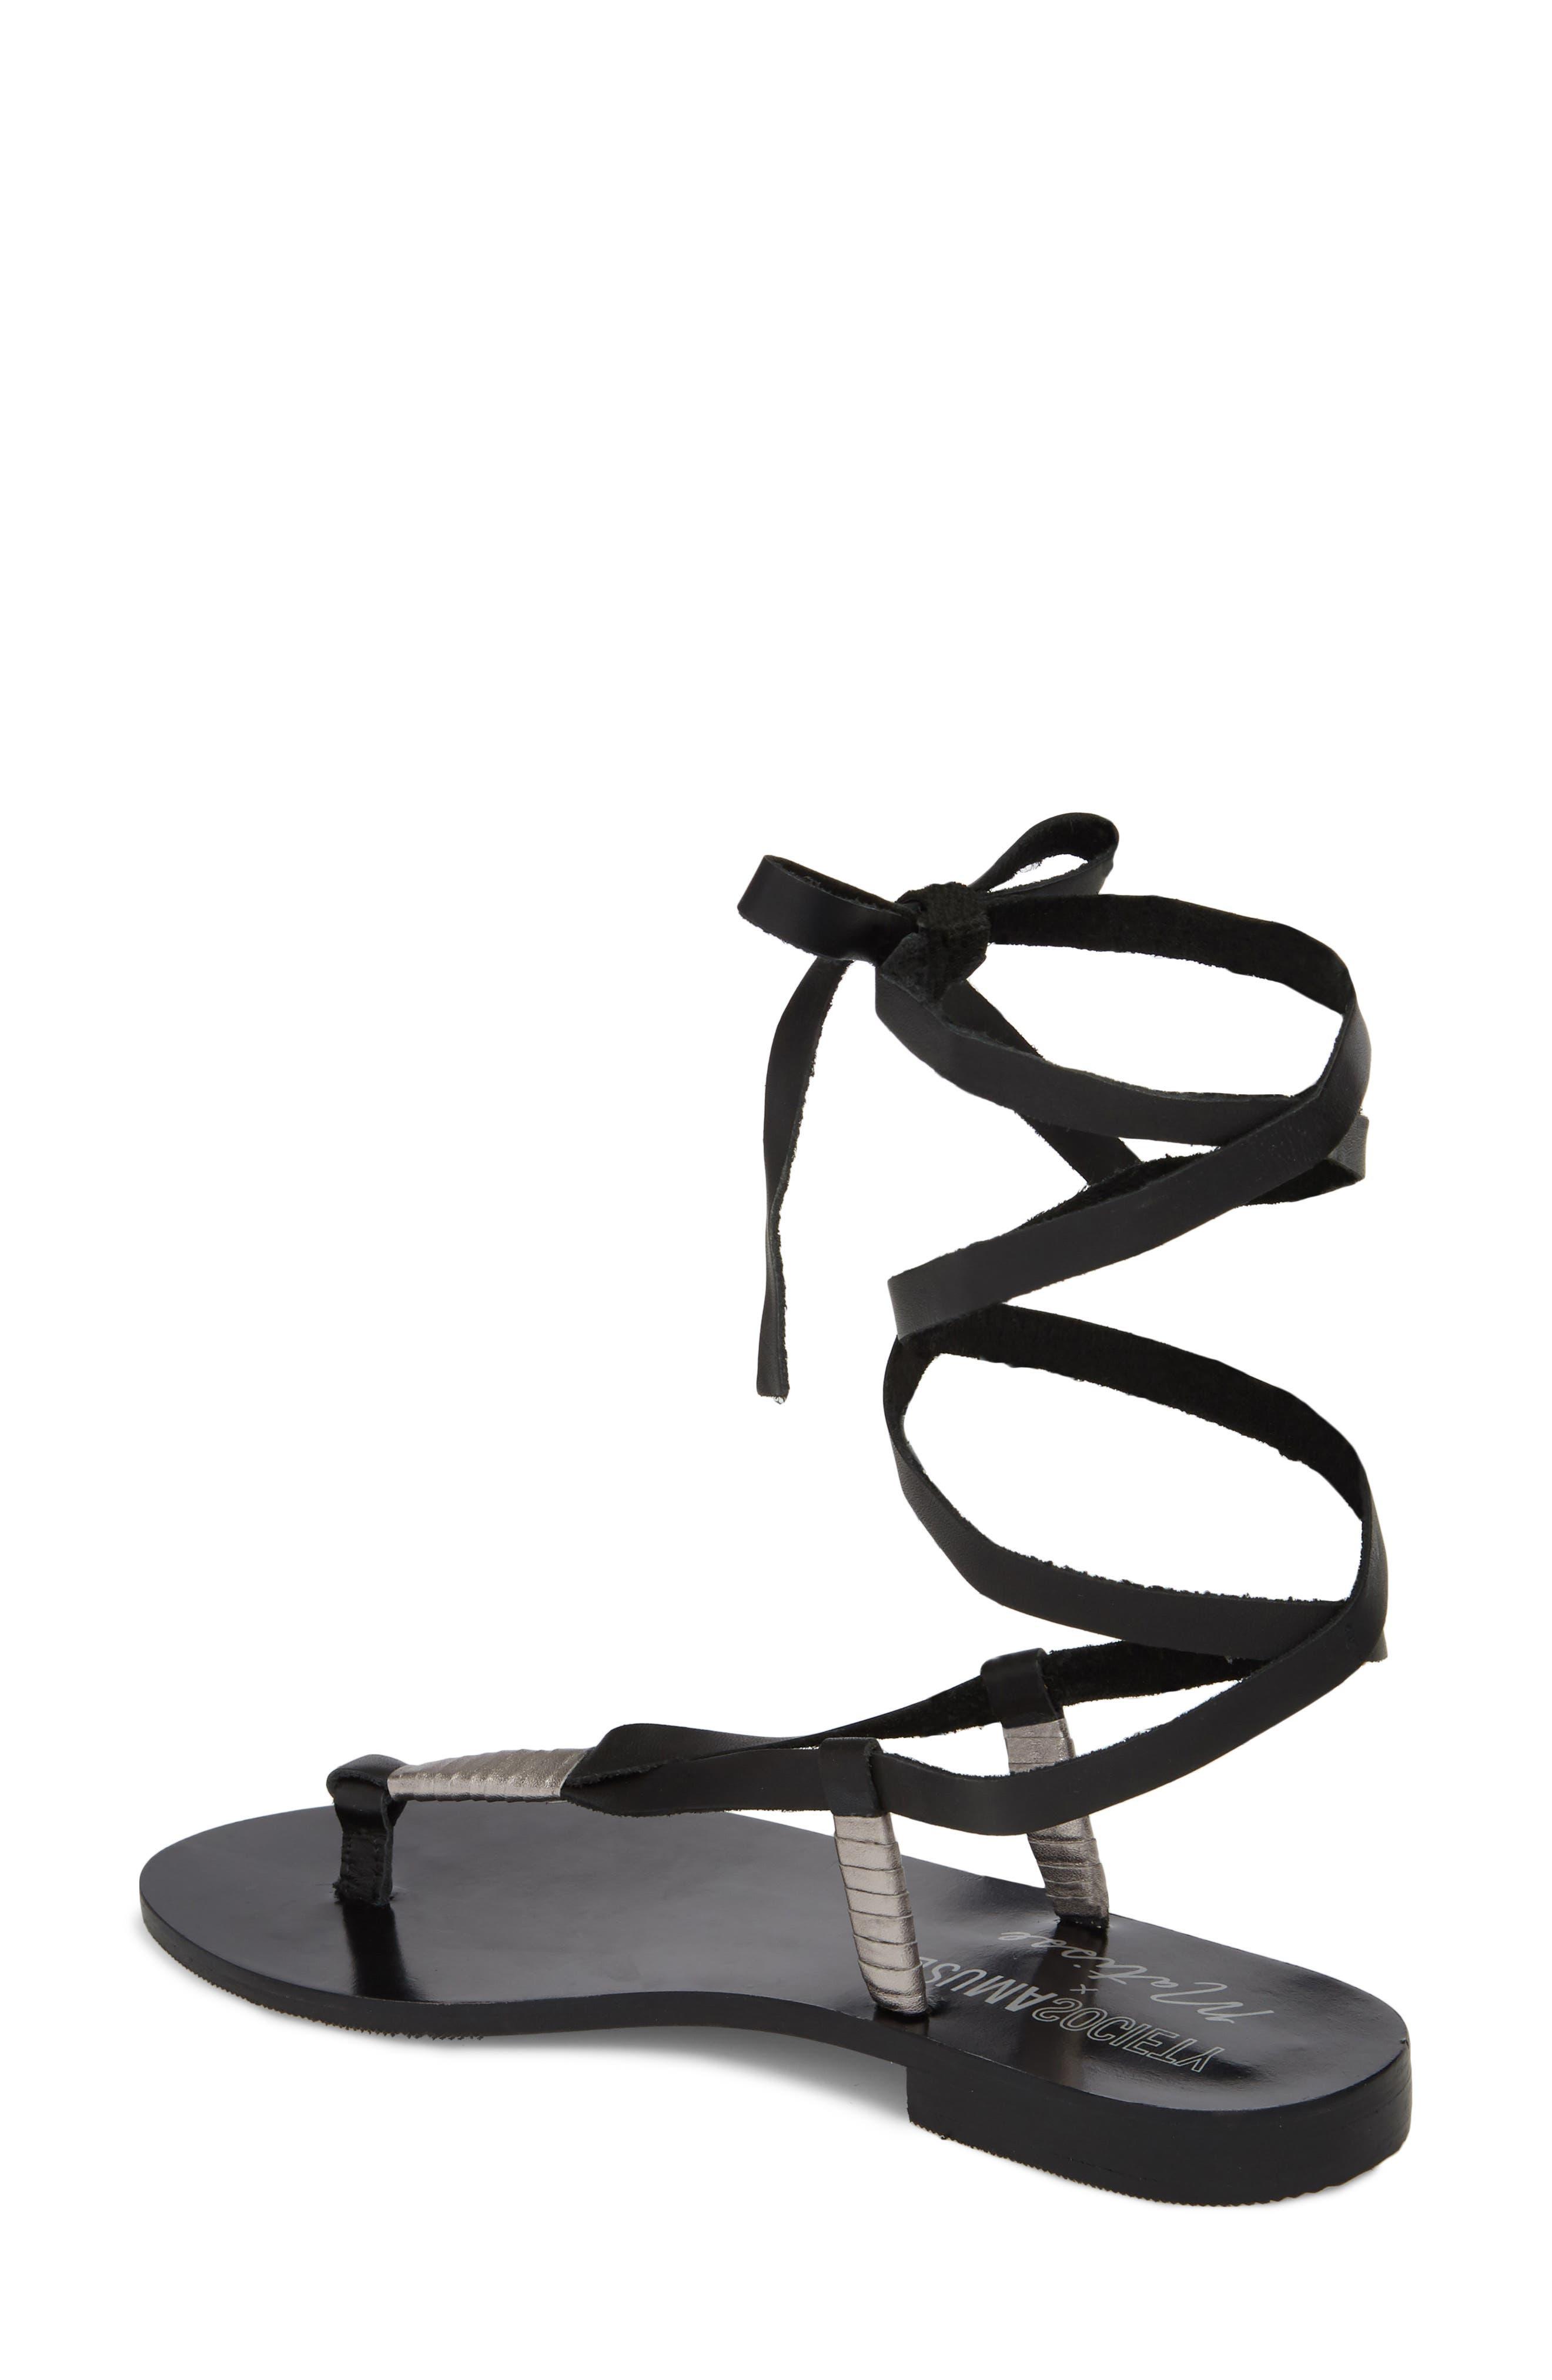 Amuse Society x Matisse Positano Sandal,                             Alternate thumbnail 2, color,                             Black Leather